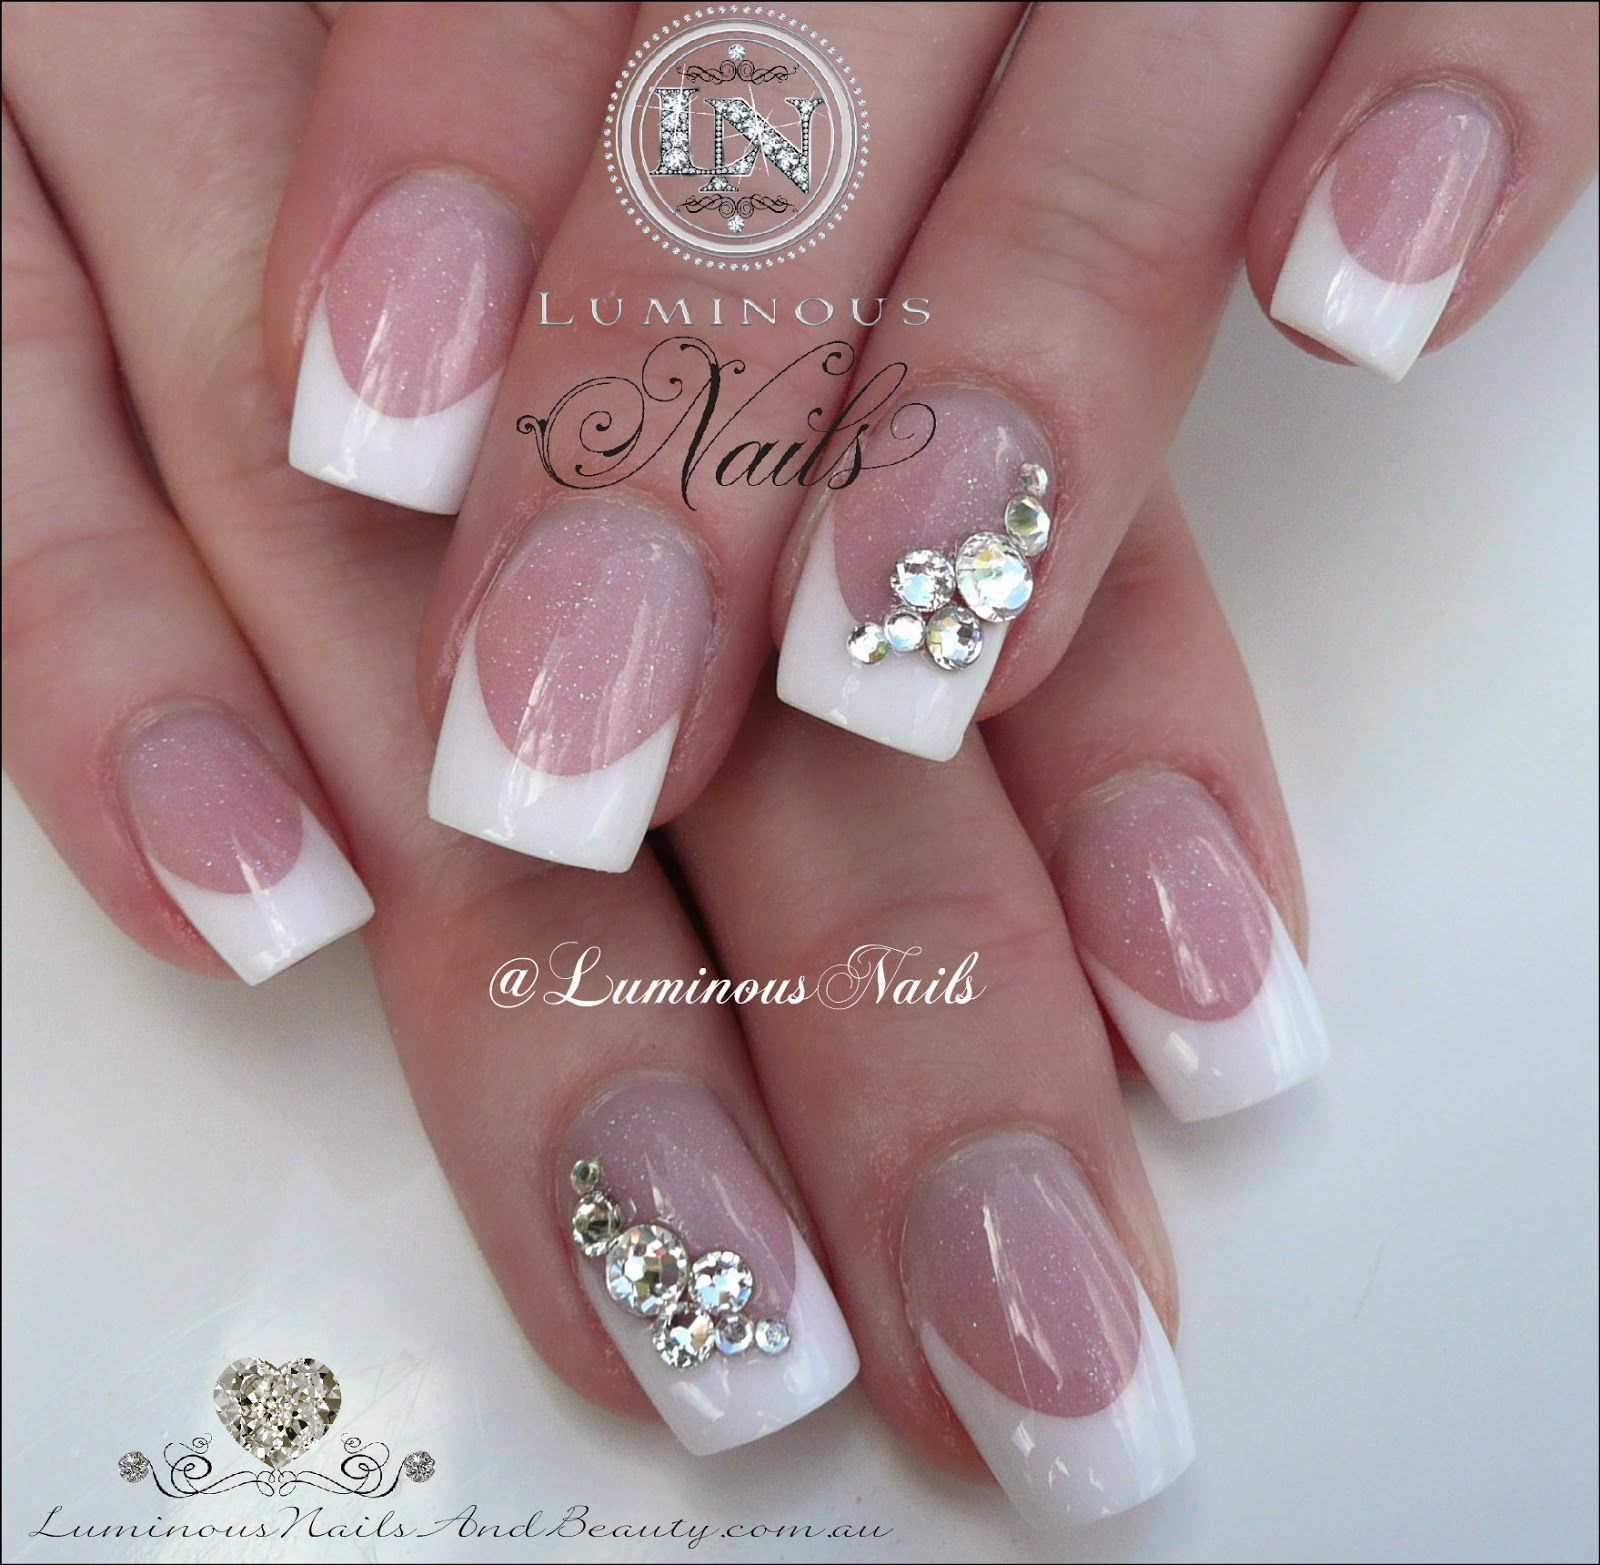 Luminous Nails: Classic French Wedding Nails with Swarovski Crystals ...